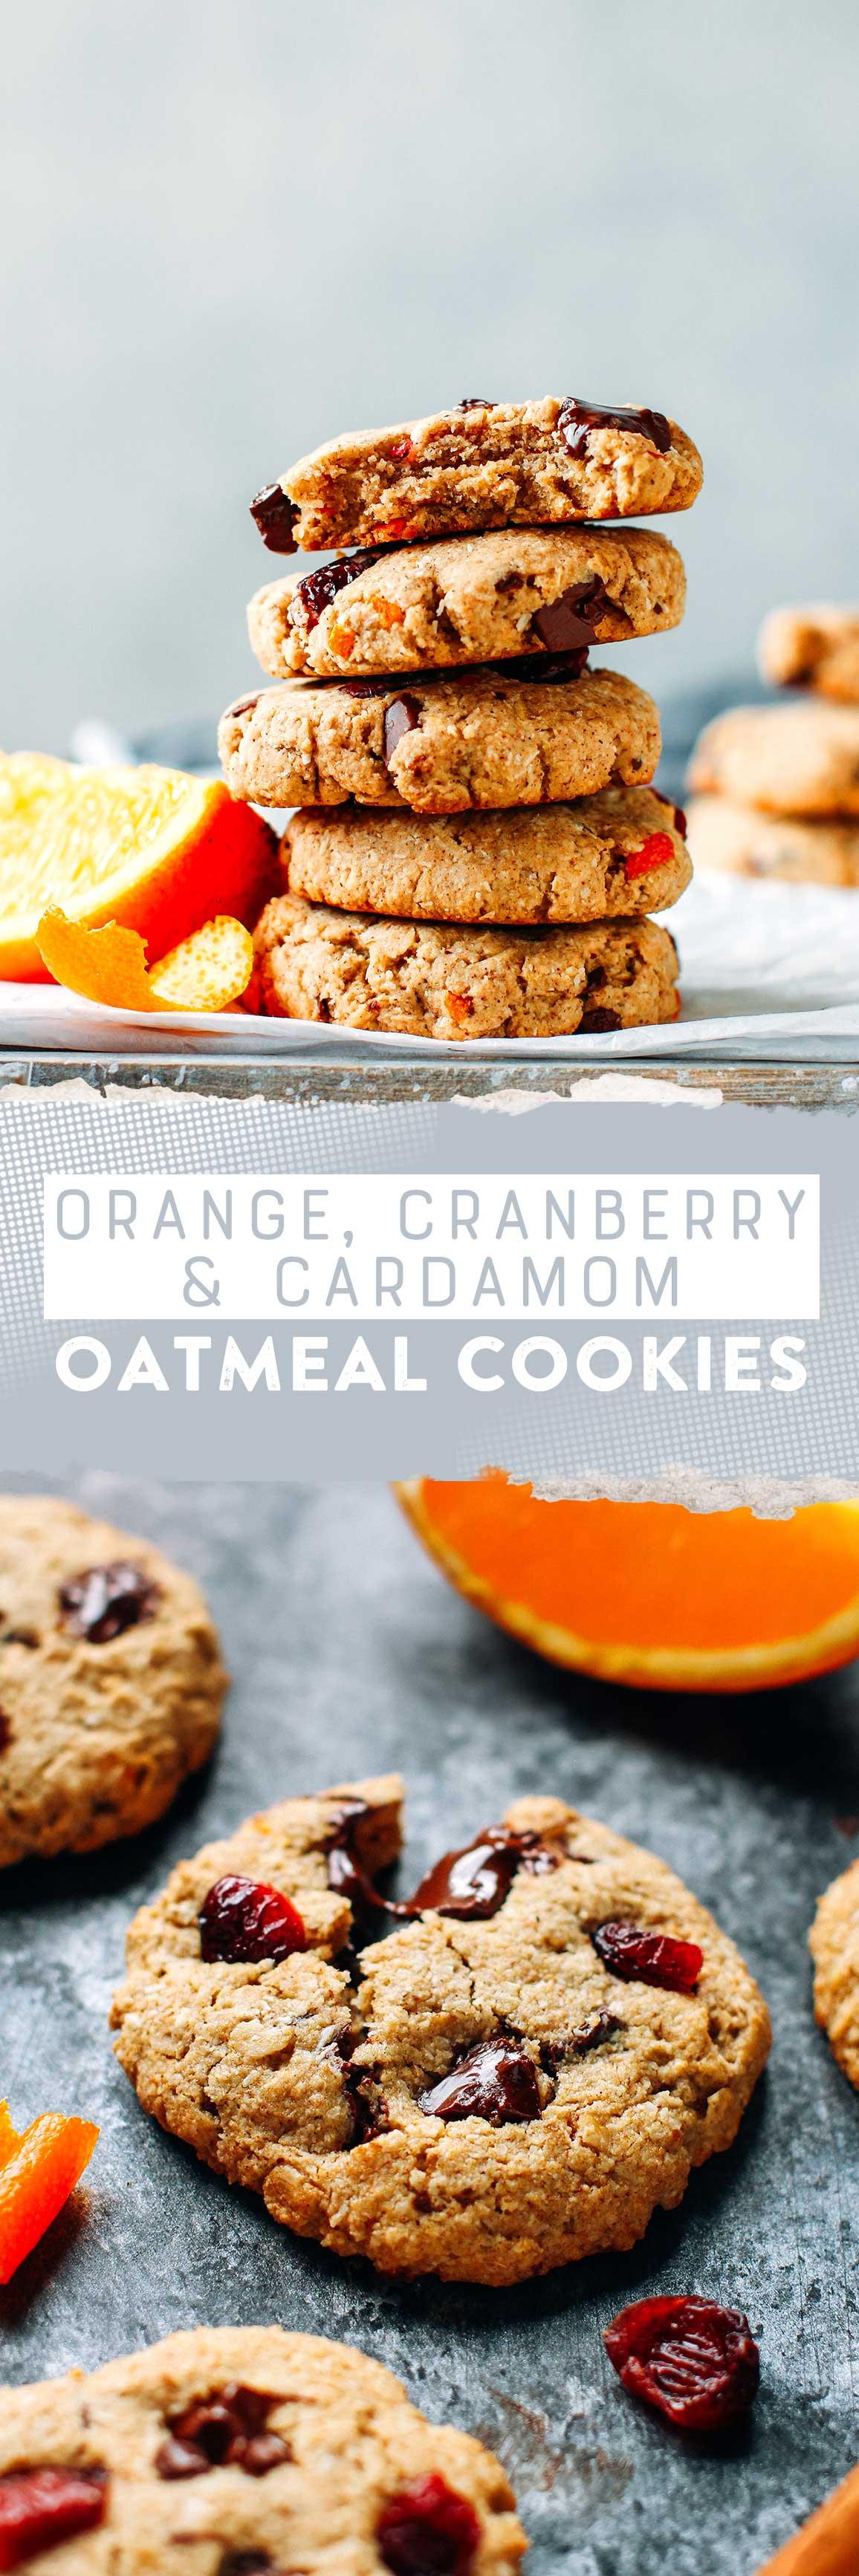 Orange, Cranberry & Cardamom Oatmeal Cookies